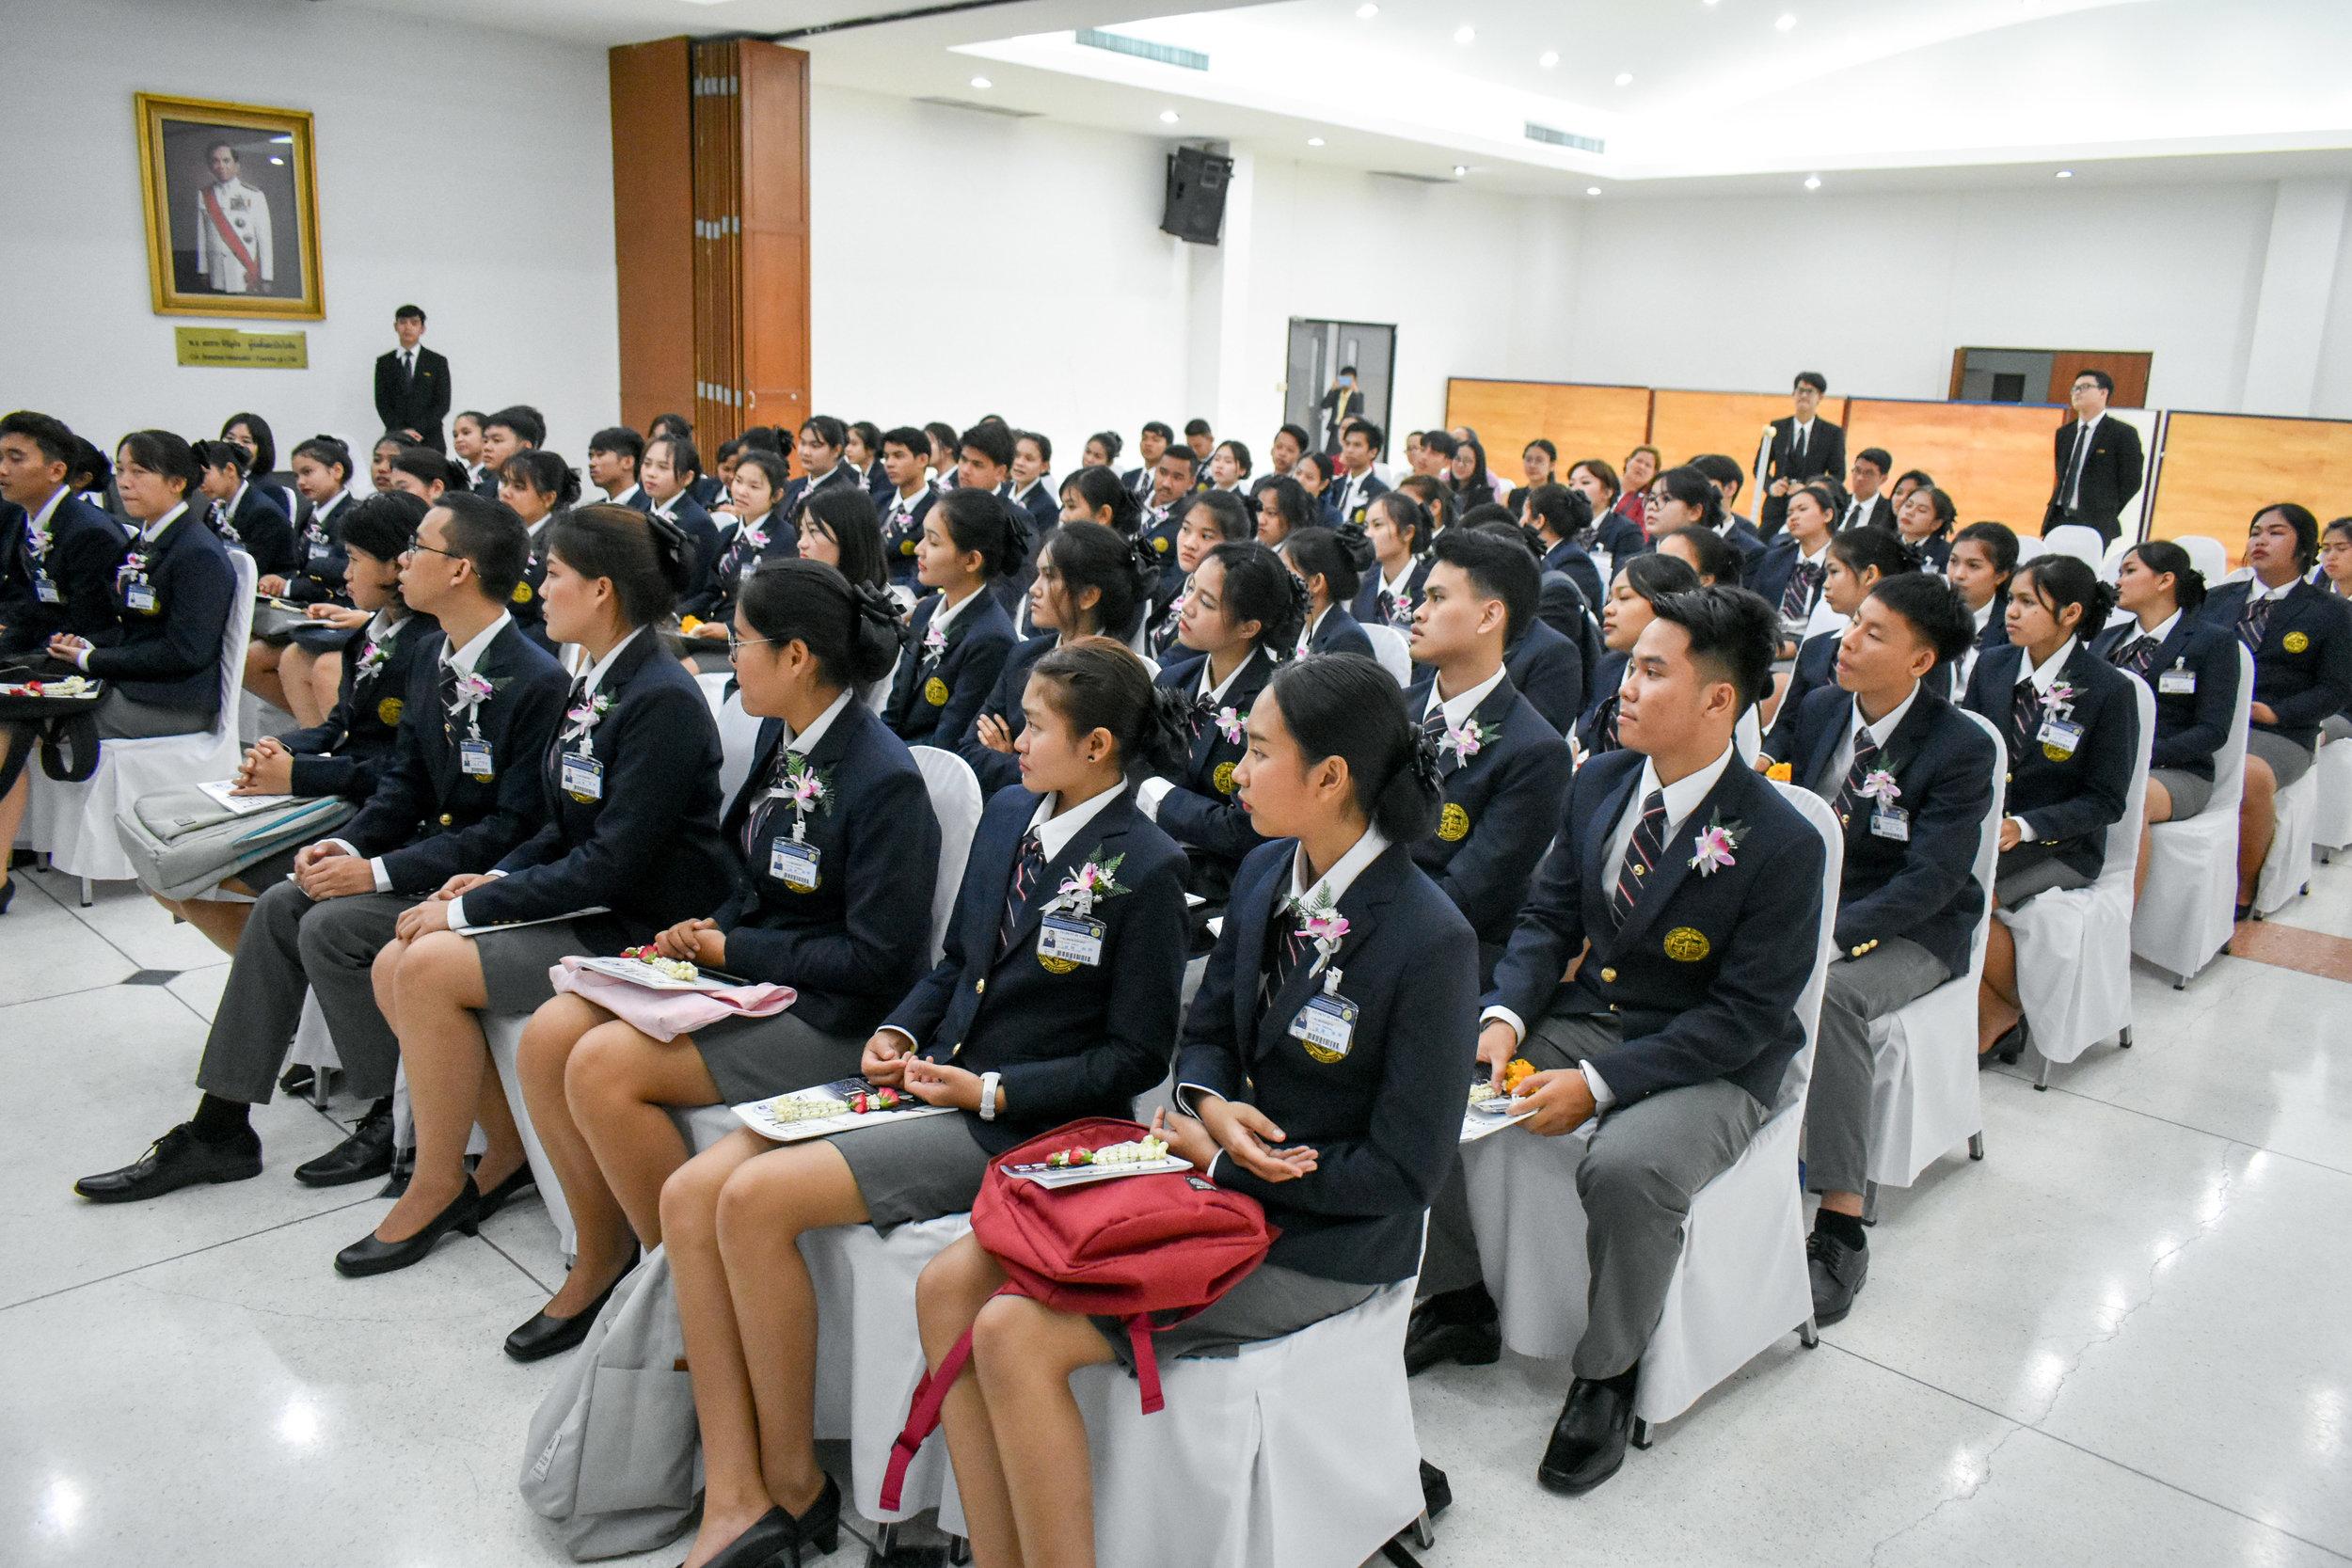 orientation day (22 of 57).jpg